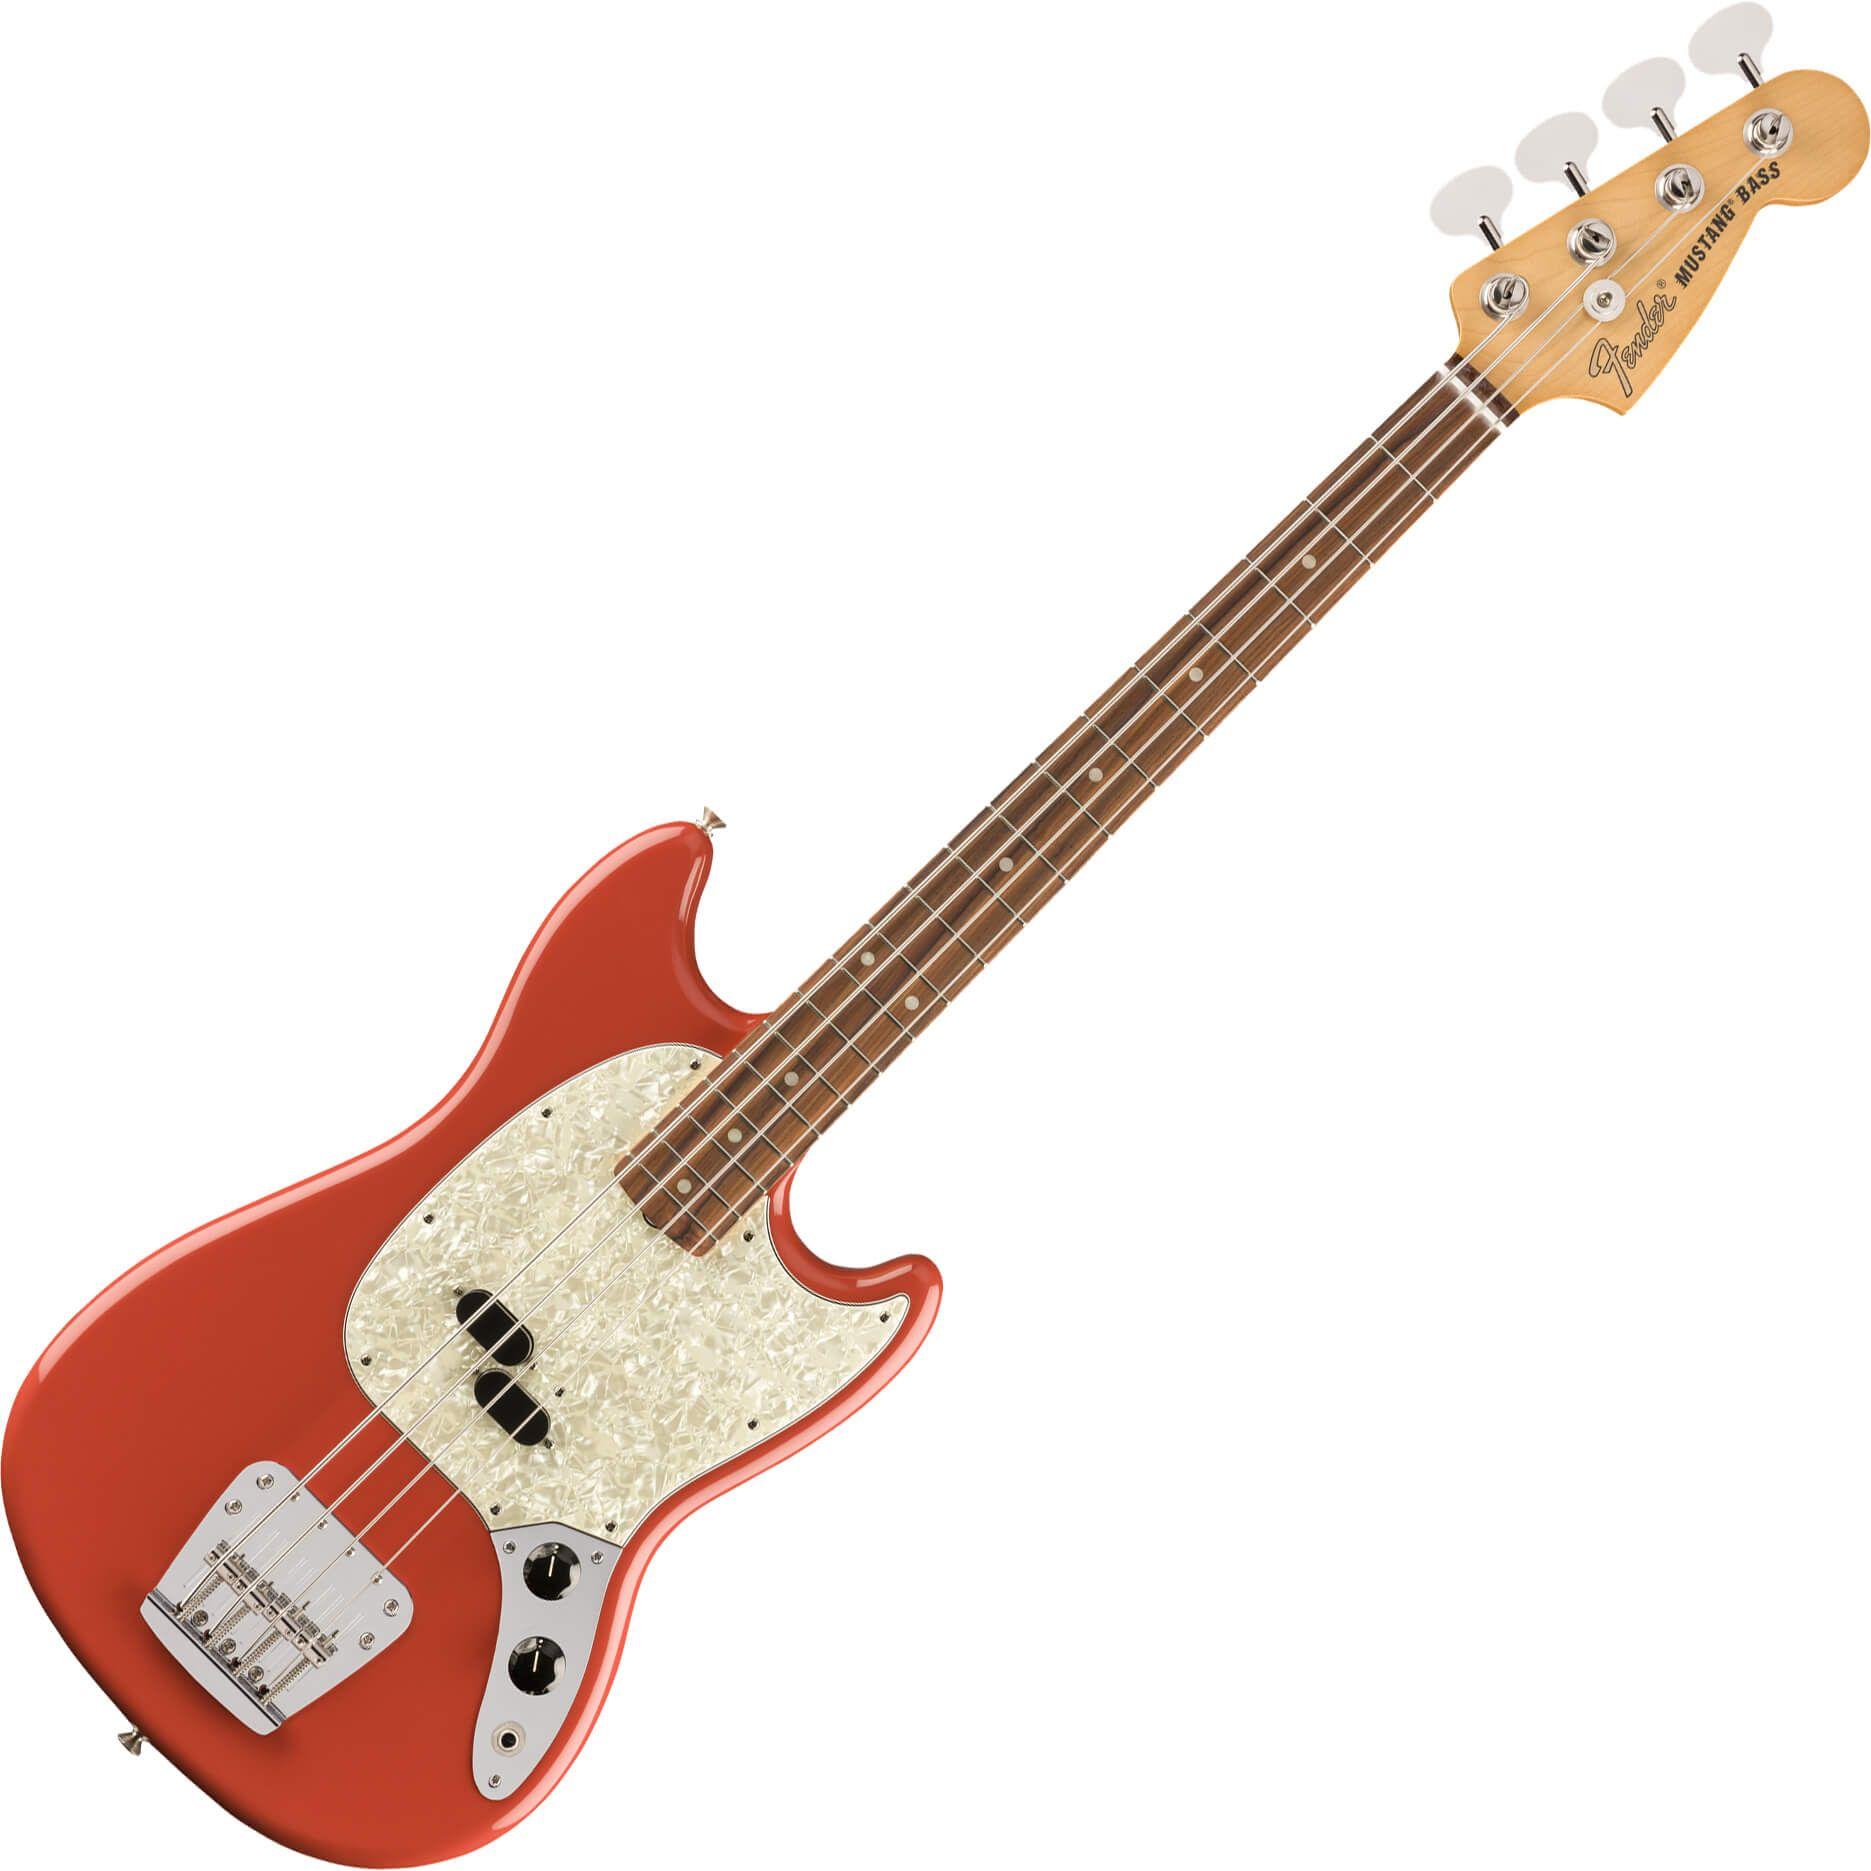 Fender Vintera Series 60s Mustang Bass - PF - Fiesta Red